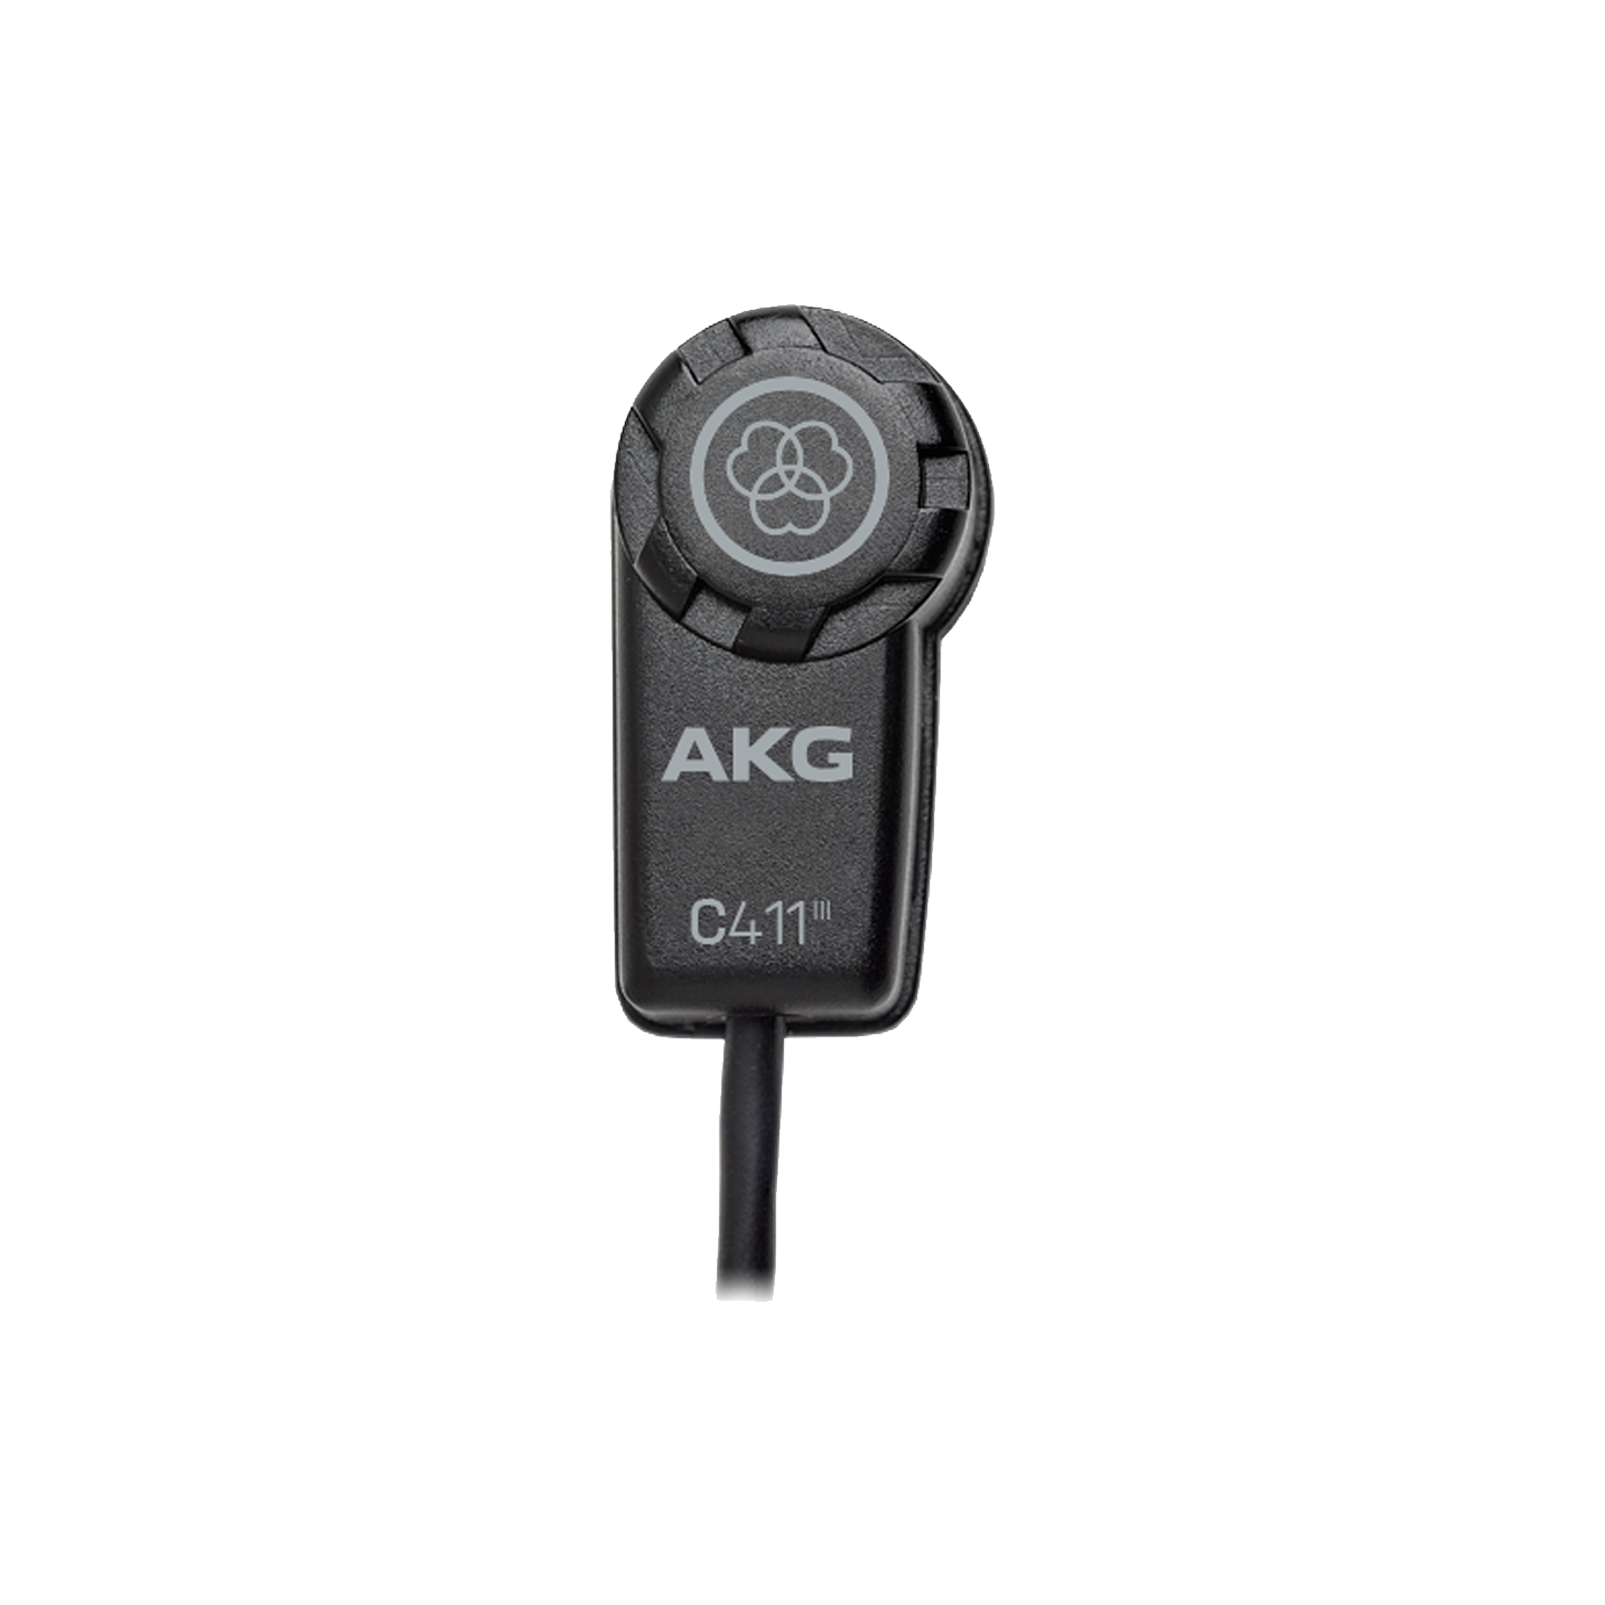 C411 L - Black - High-performance miniature condenser vibration pickup with mini XLR connector - Hero